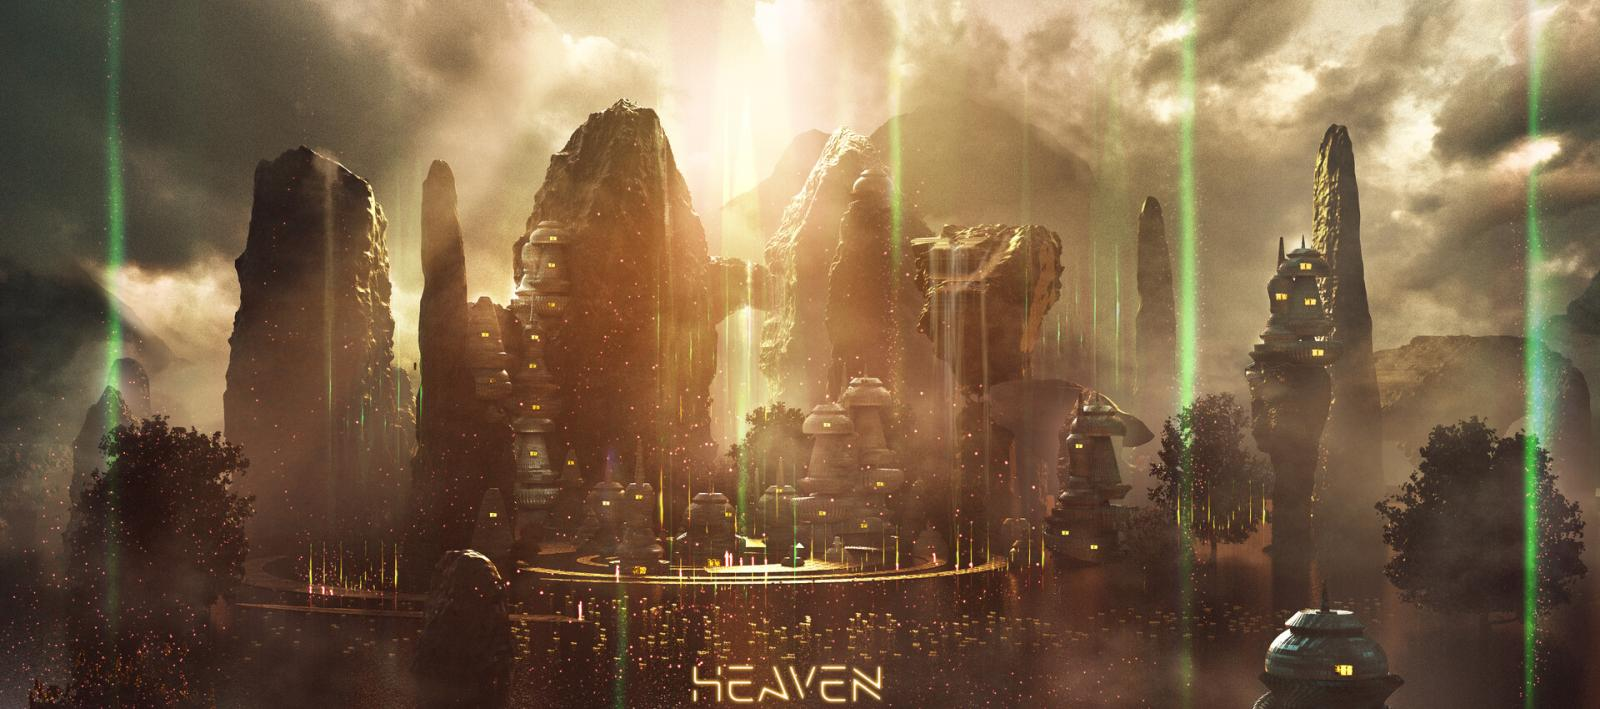 shankar-kumar-heaven.jpg